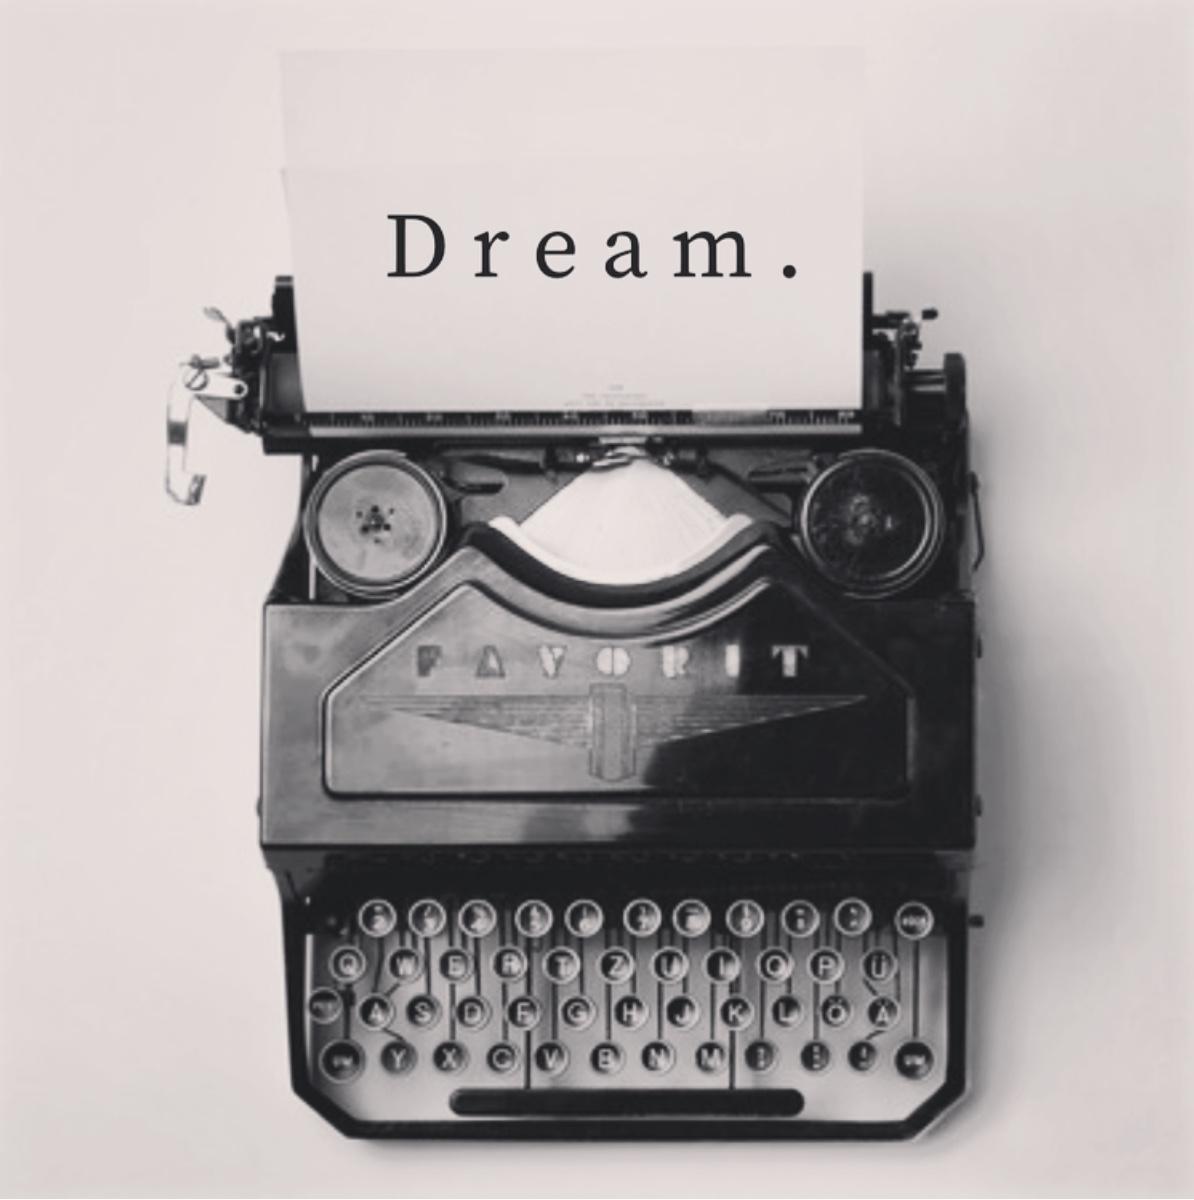 Dreaming Big…